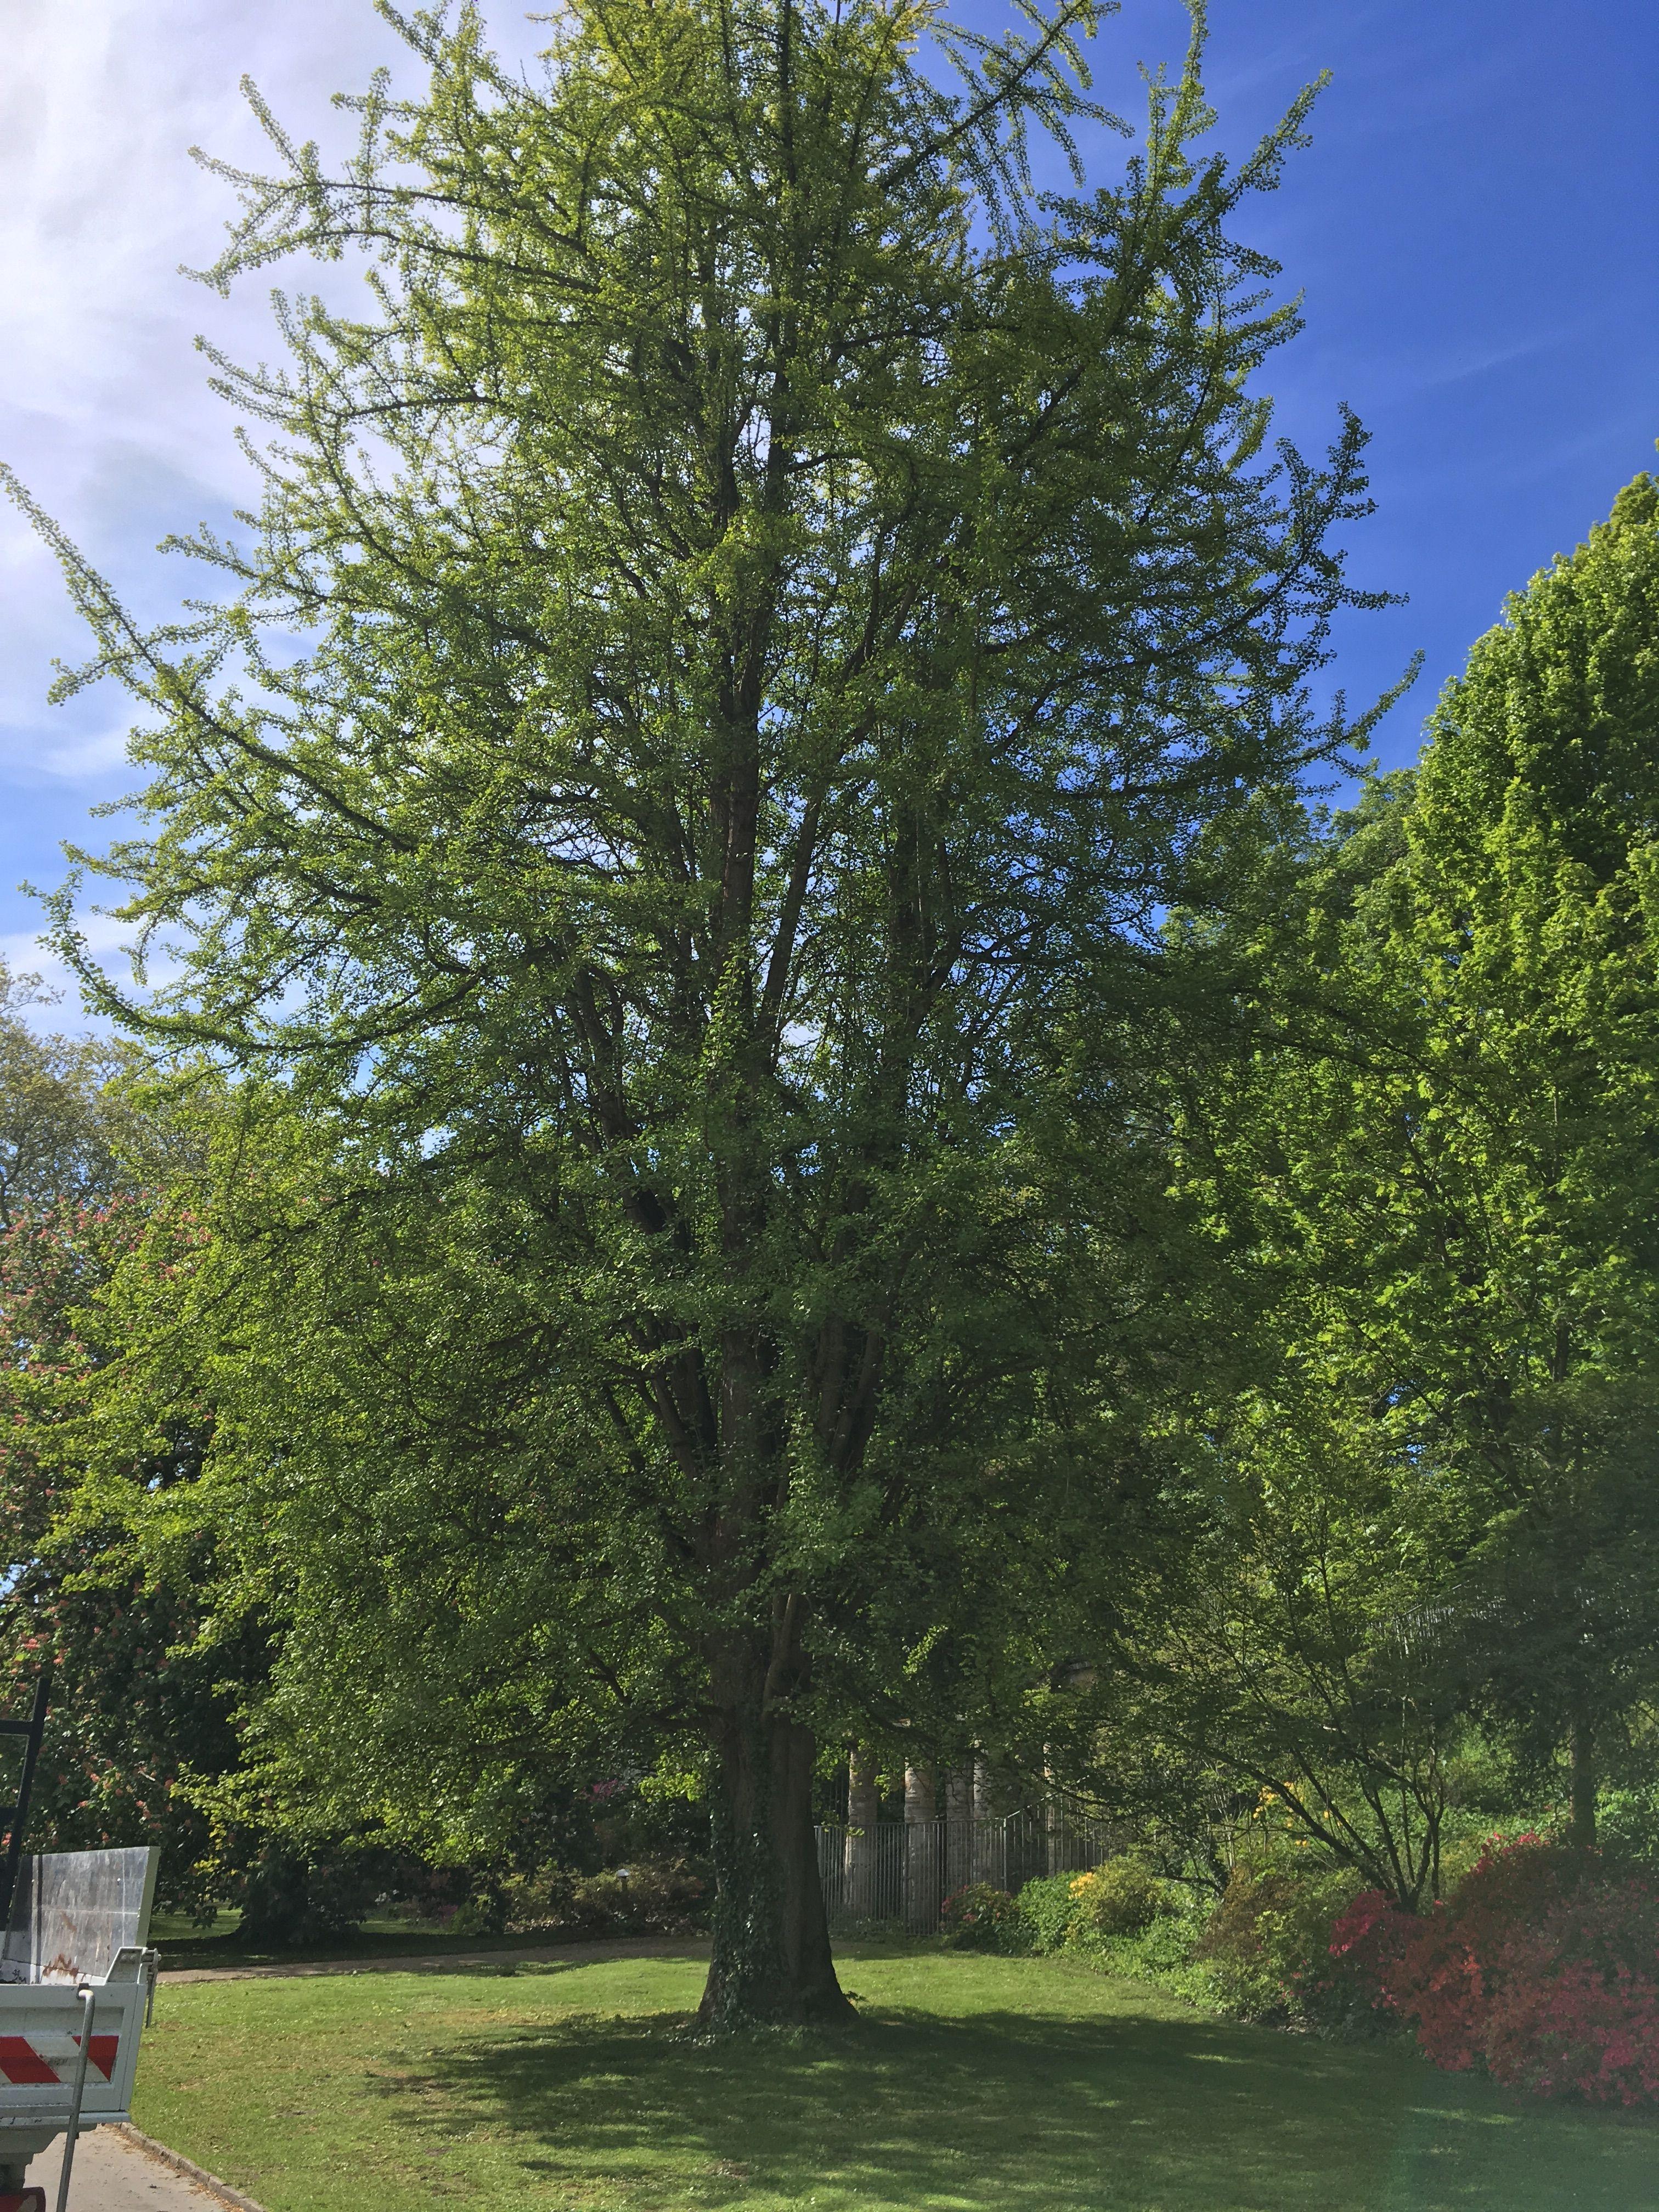 Pin By On Botanischer Garten Rombergpark Tree Plants Tree Trunk